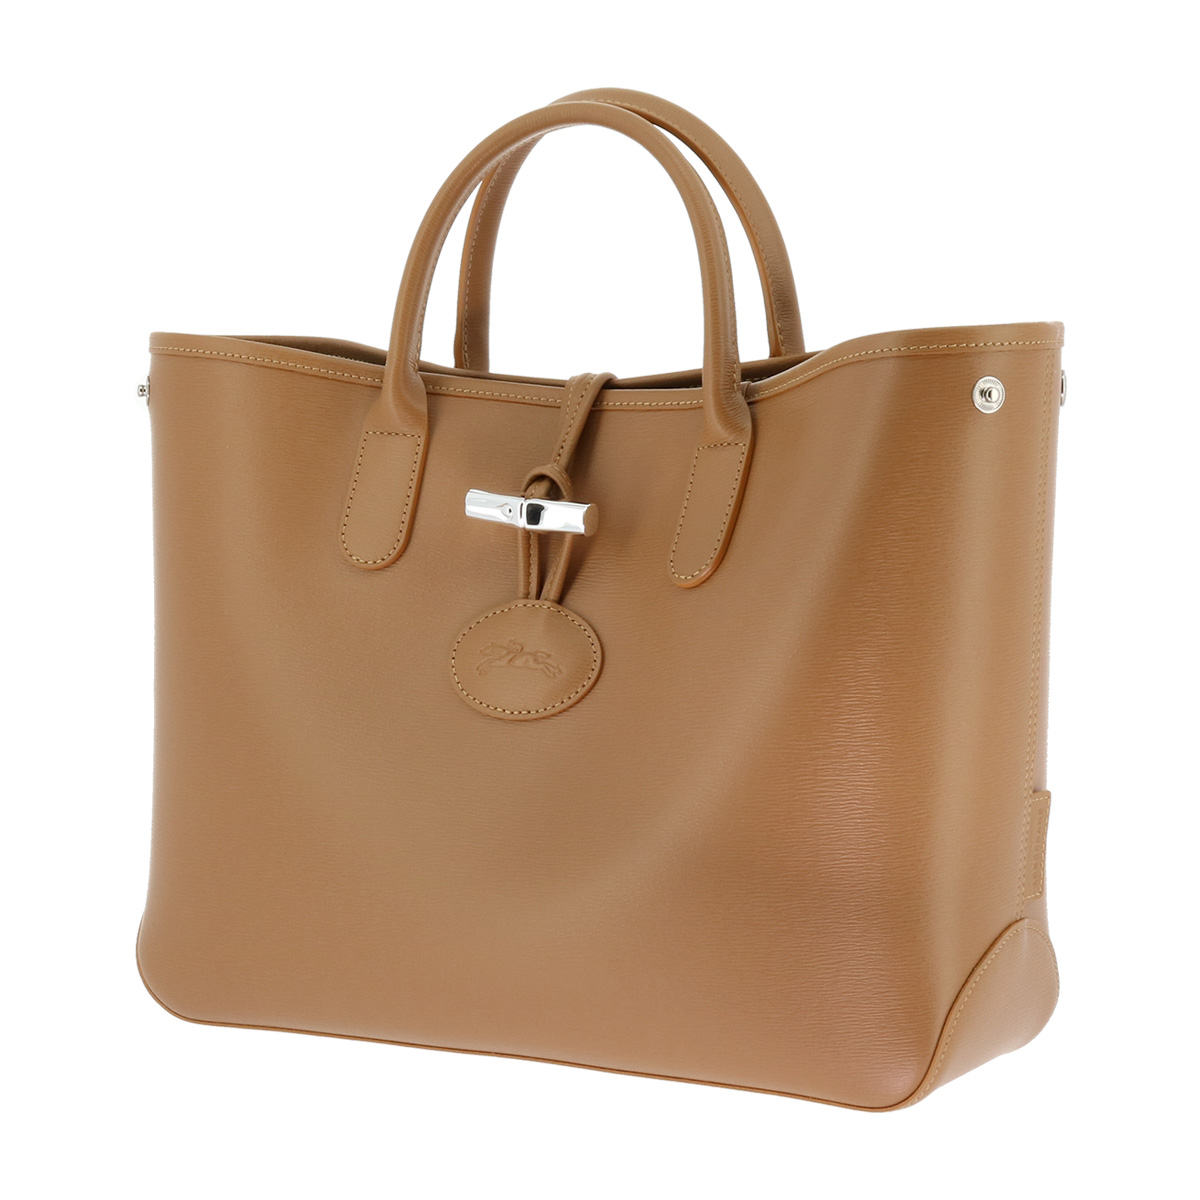 SM SunniMix Durable Genuine Leather Strap Replacement for Bag Handbag Crossbody Purse Duffel Bags 120cm Brown 120cm